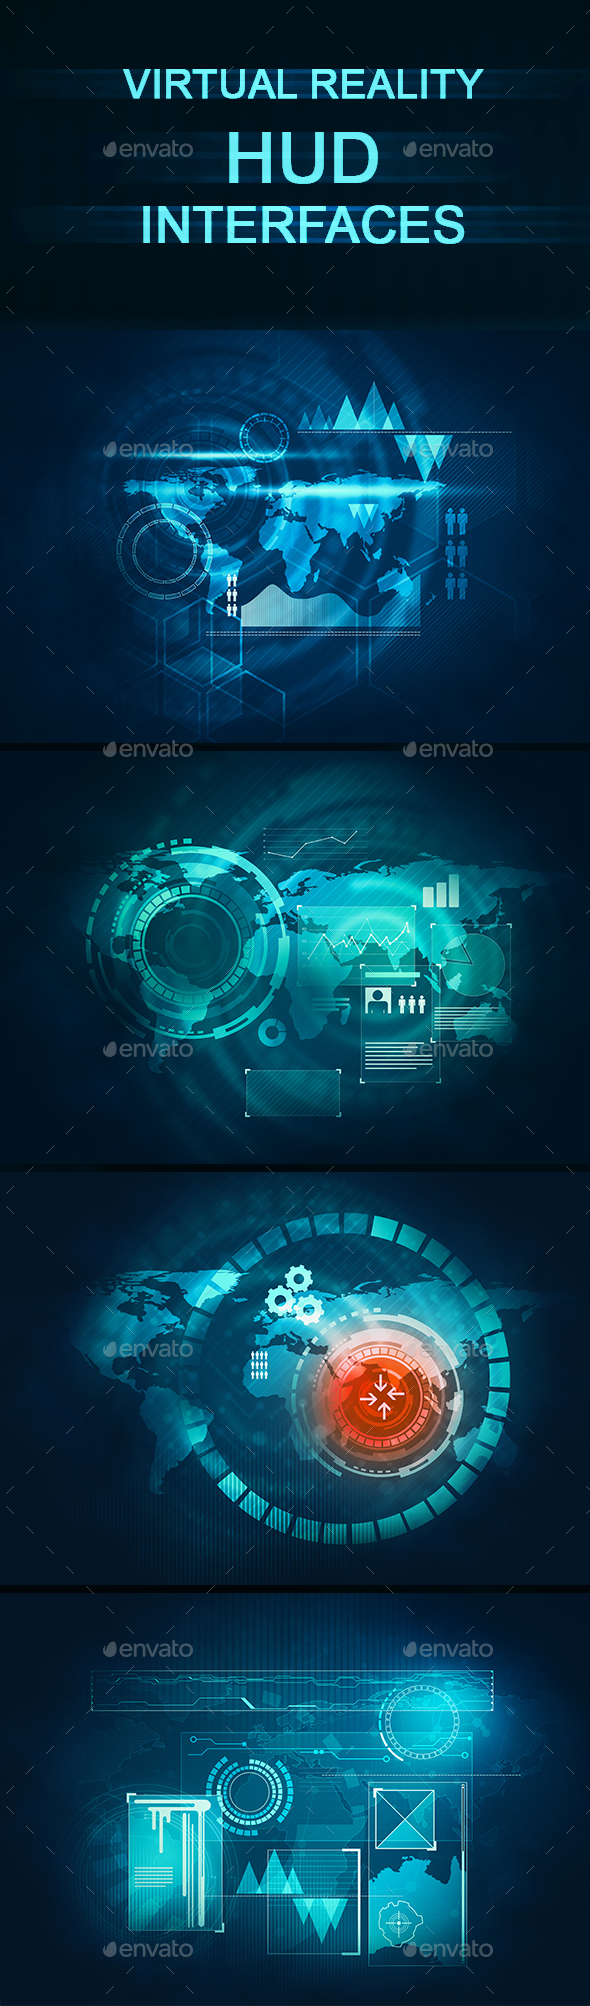 Virtual Reality Interfaces - Tech / Futuristic Backgrounds